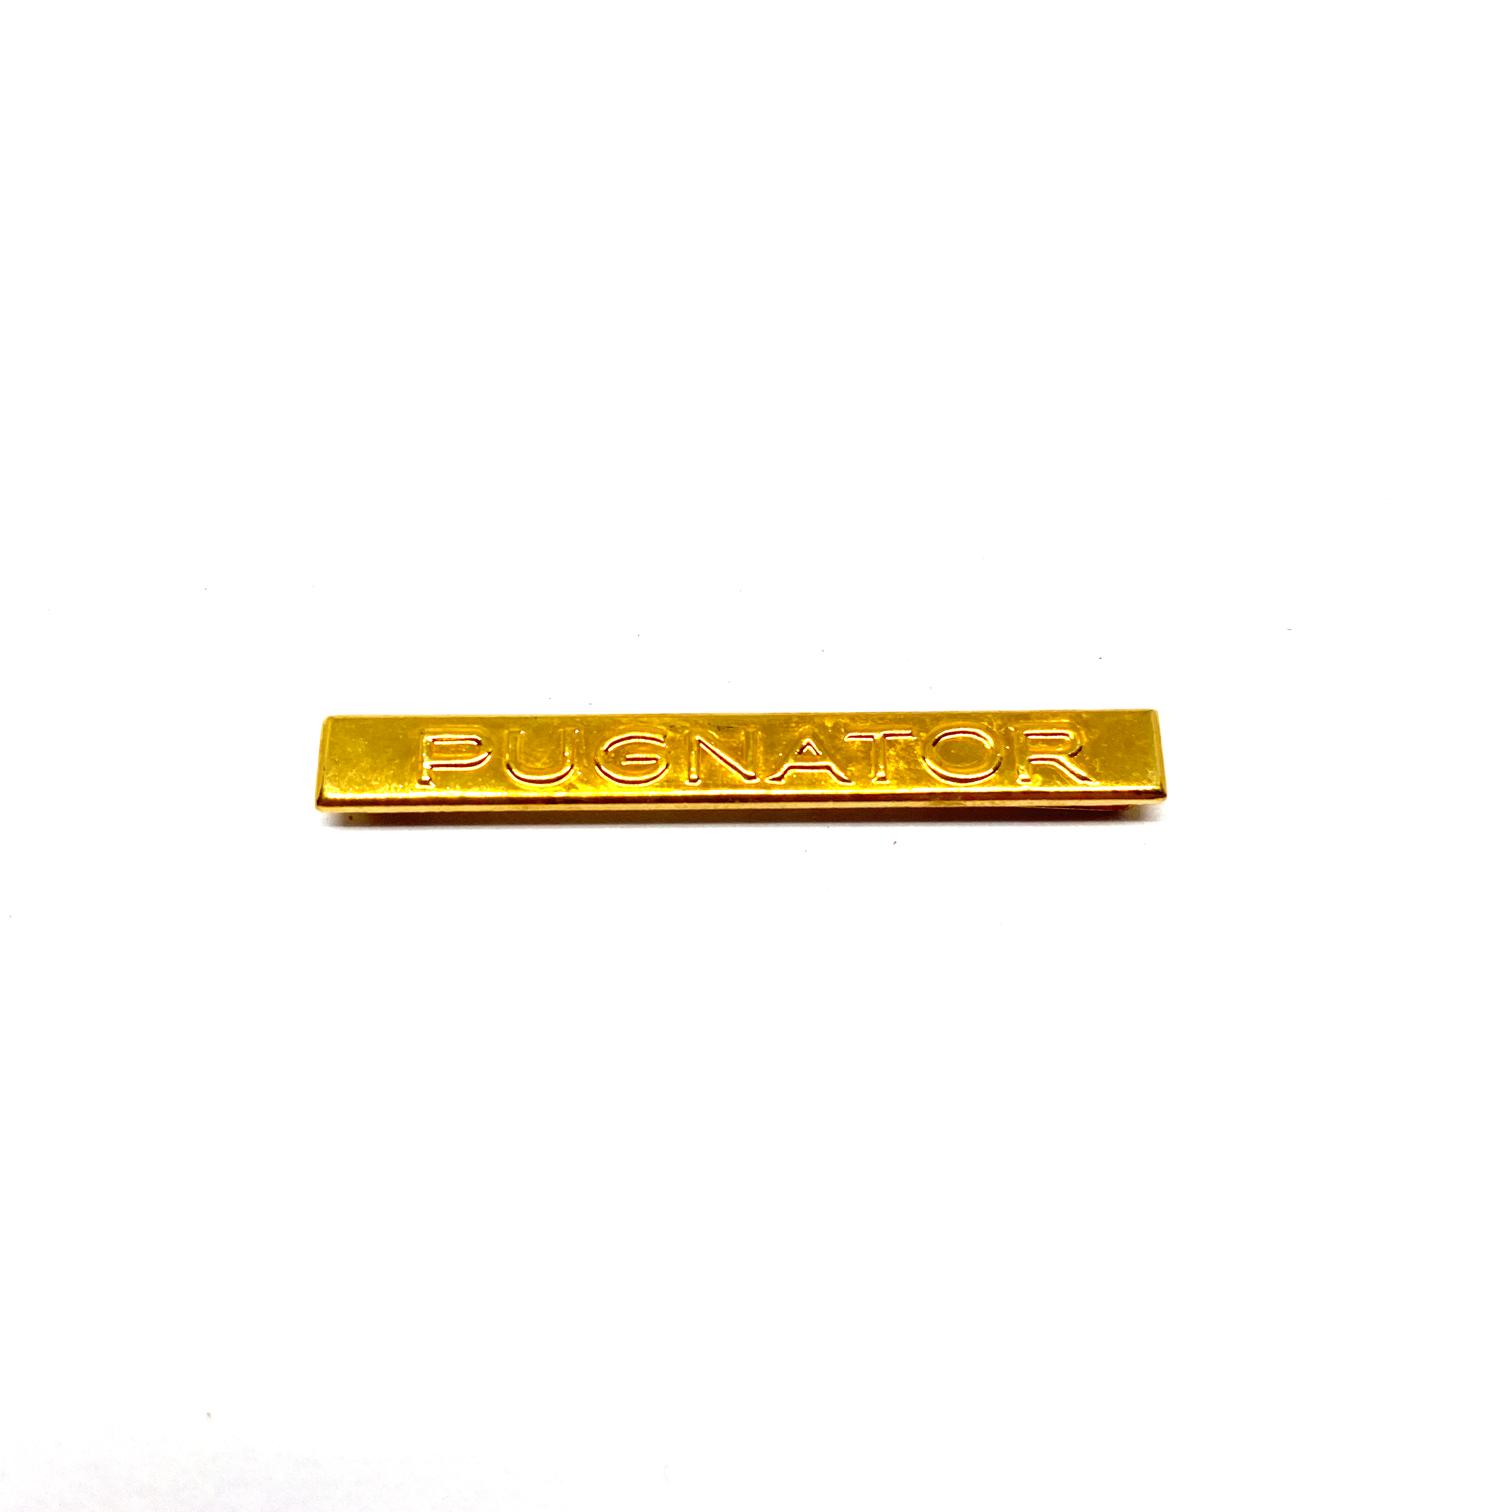 Bar Pugnator for war medals